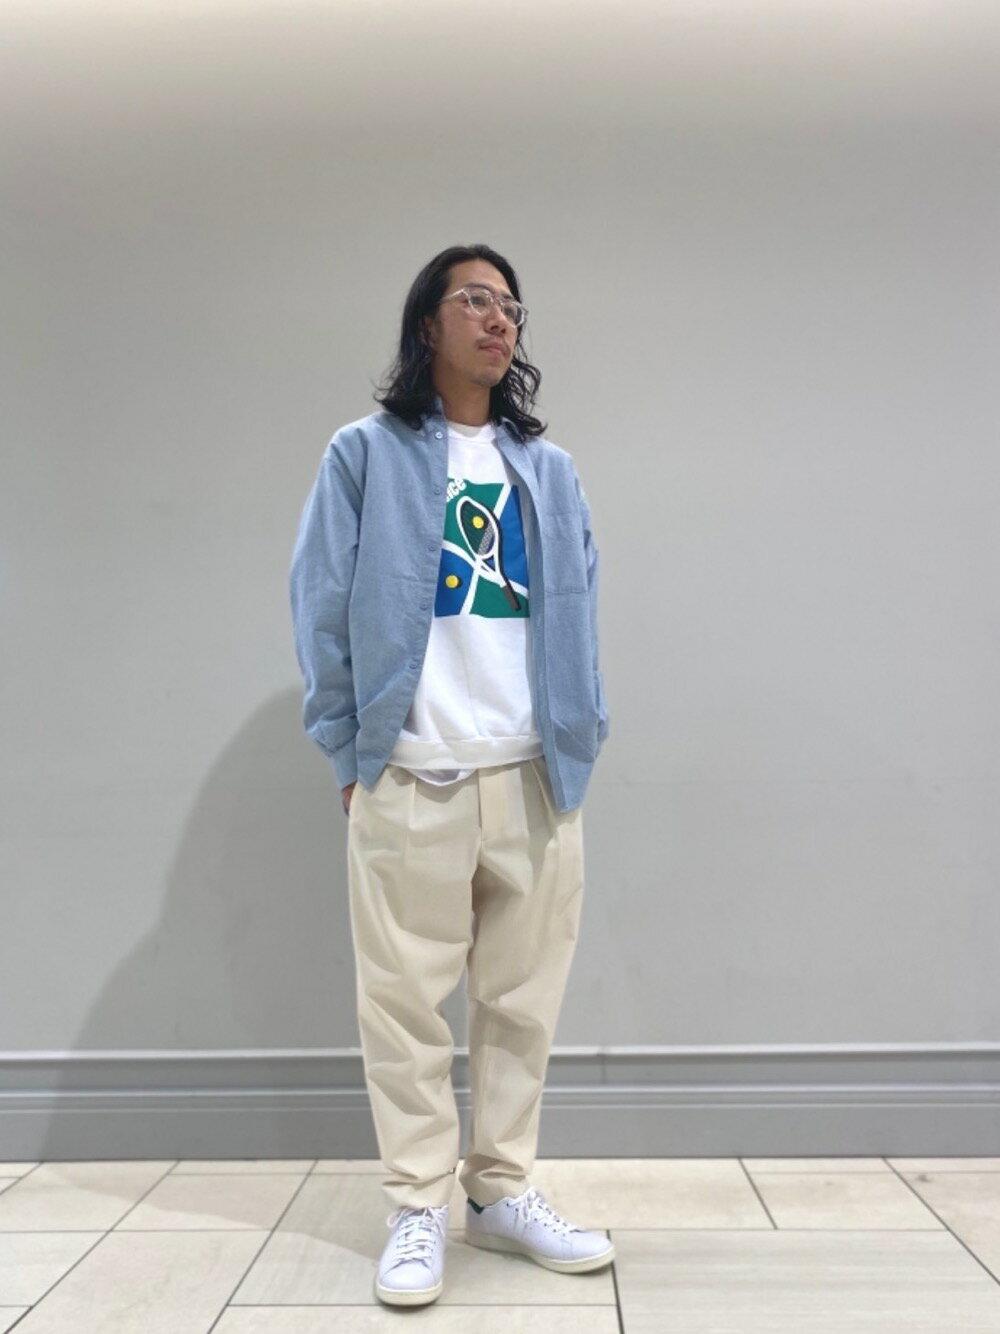 BEAUTY & YOUTH UNITED ARROWSのUNITED ARROWS by KANEKO OPTICAL Kevin/アイウェア MADE IN JAPANを使ったコーディネートを紹介します。 Rakuten Fashion(楽天ファッション/旧楽天ブランドアベニュー)1103545